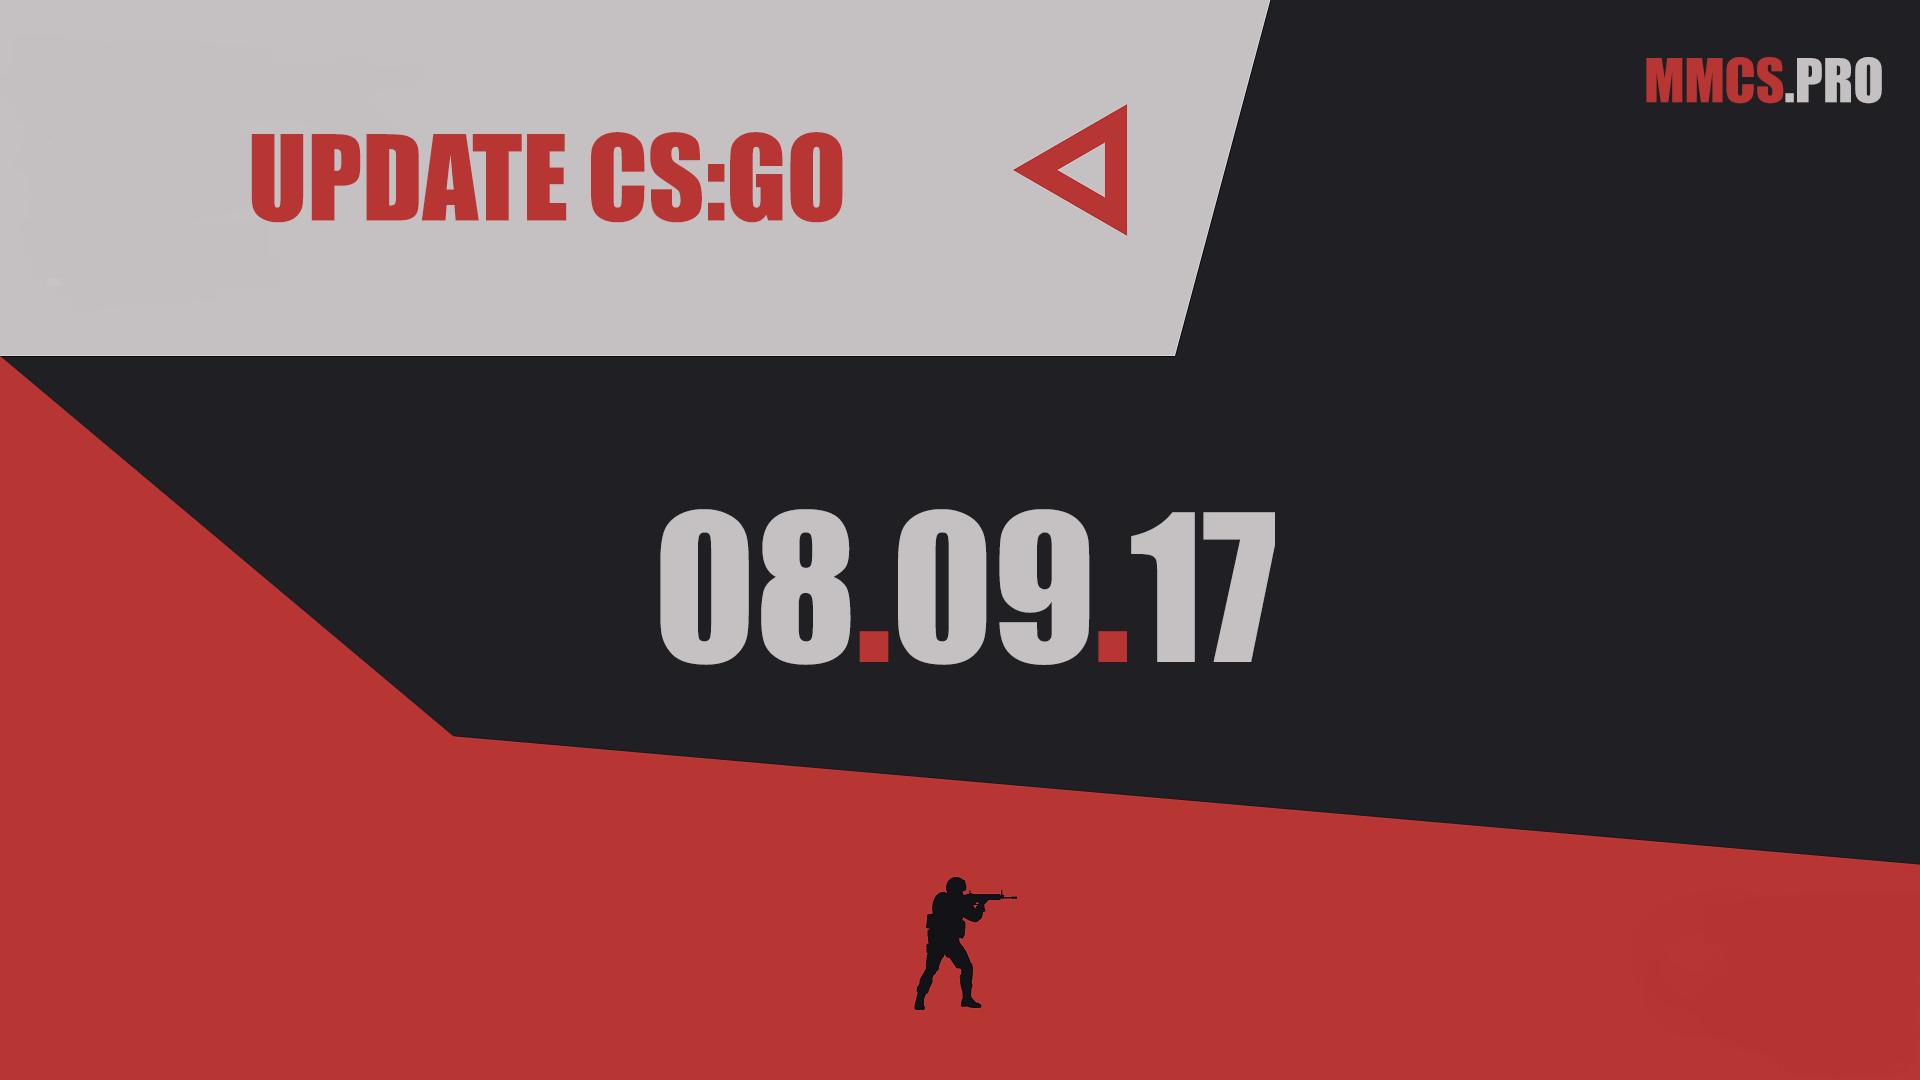 https://mmcs.pro/update-csgo-08-09-2017-valve/